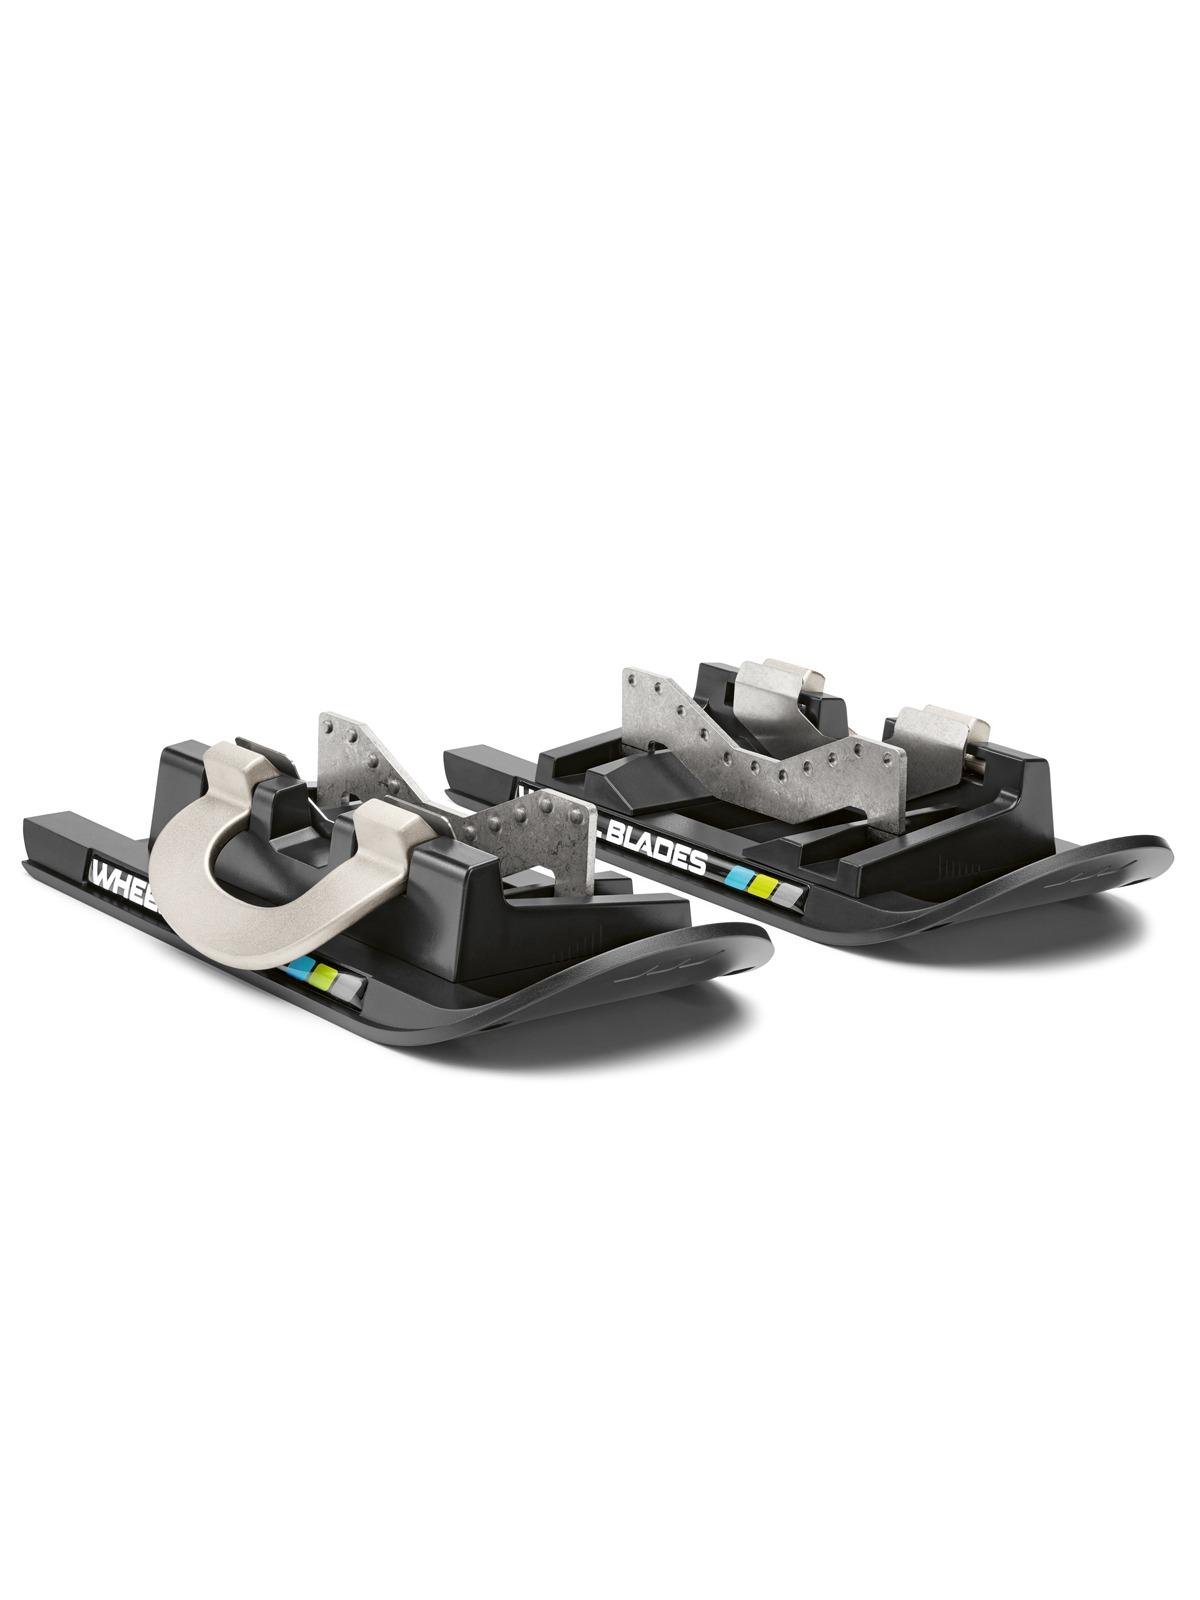 Wheelblades-1514P-2.jpg